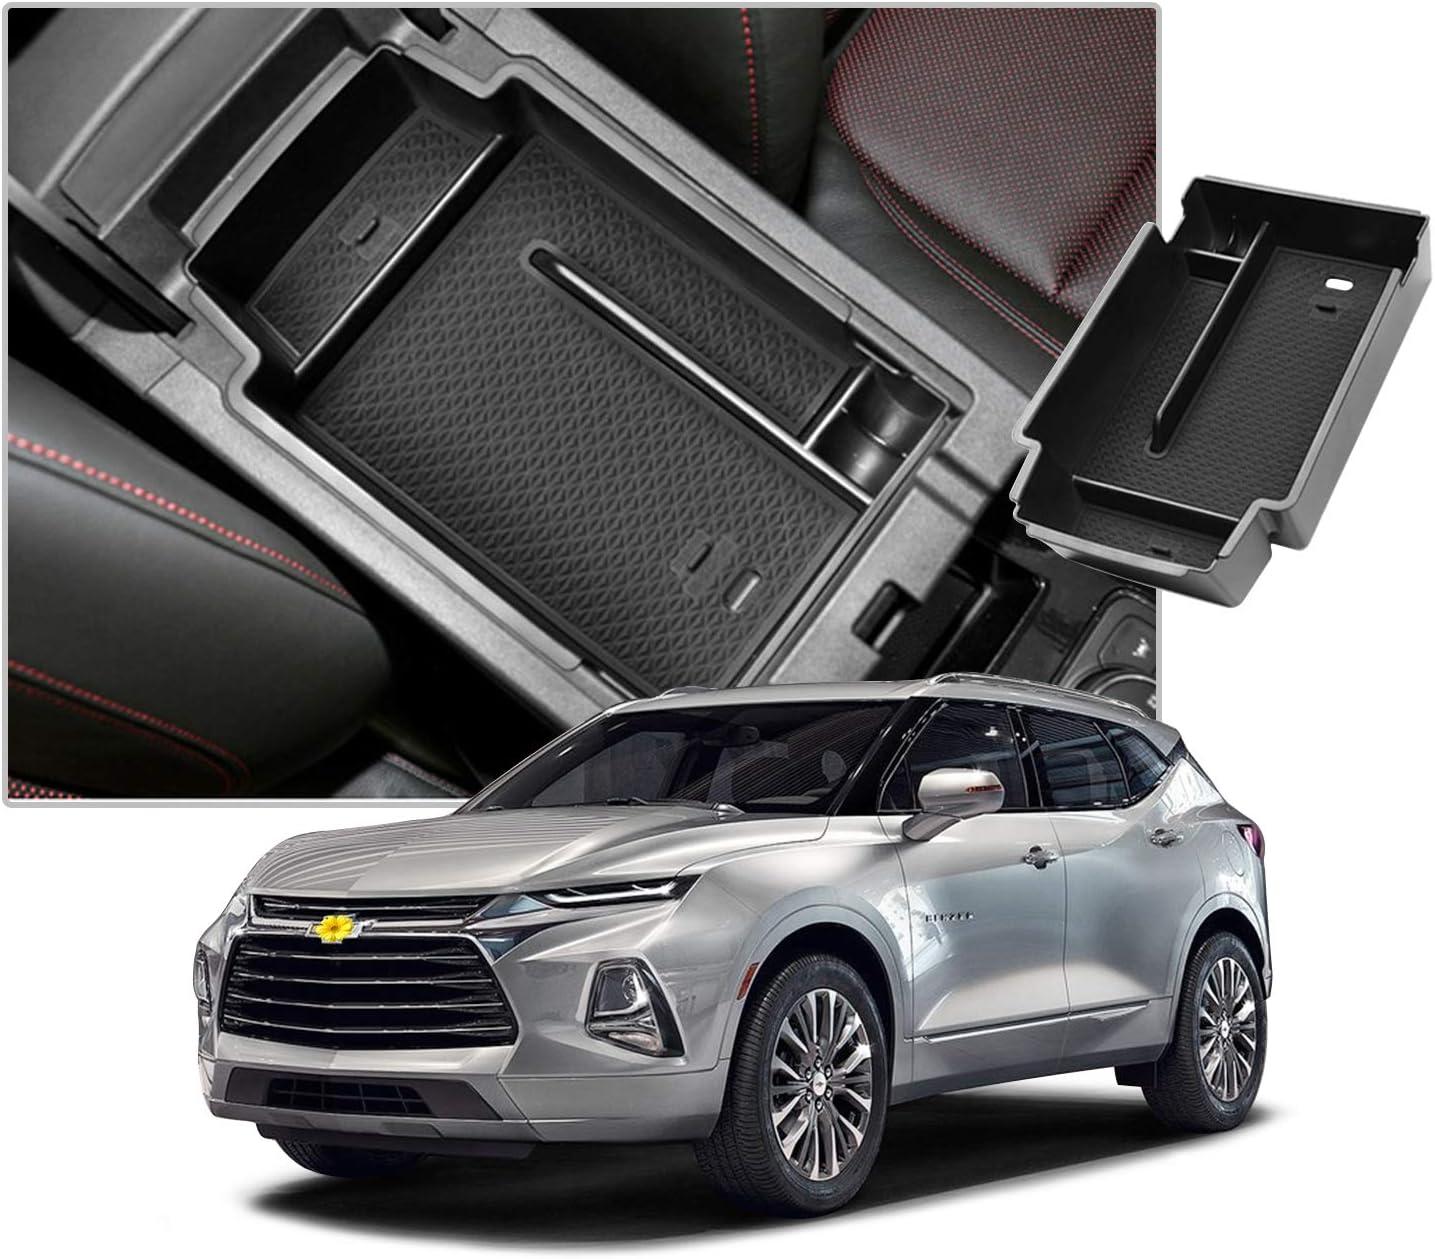 CDEFG Center Console Accessory Organizer for 2018 2019 2020 Tiguan ABS Material Armrest Box Insert Tray